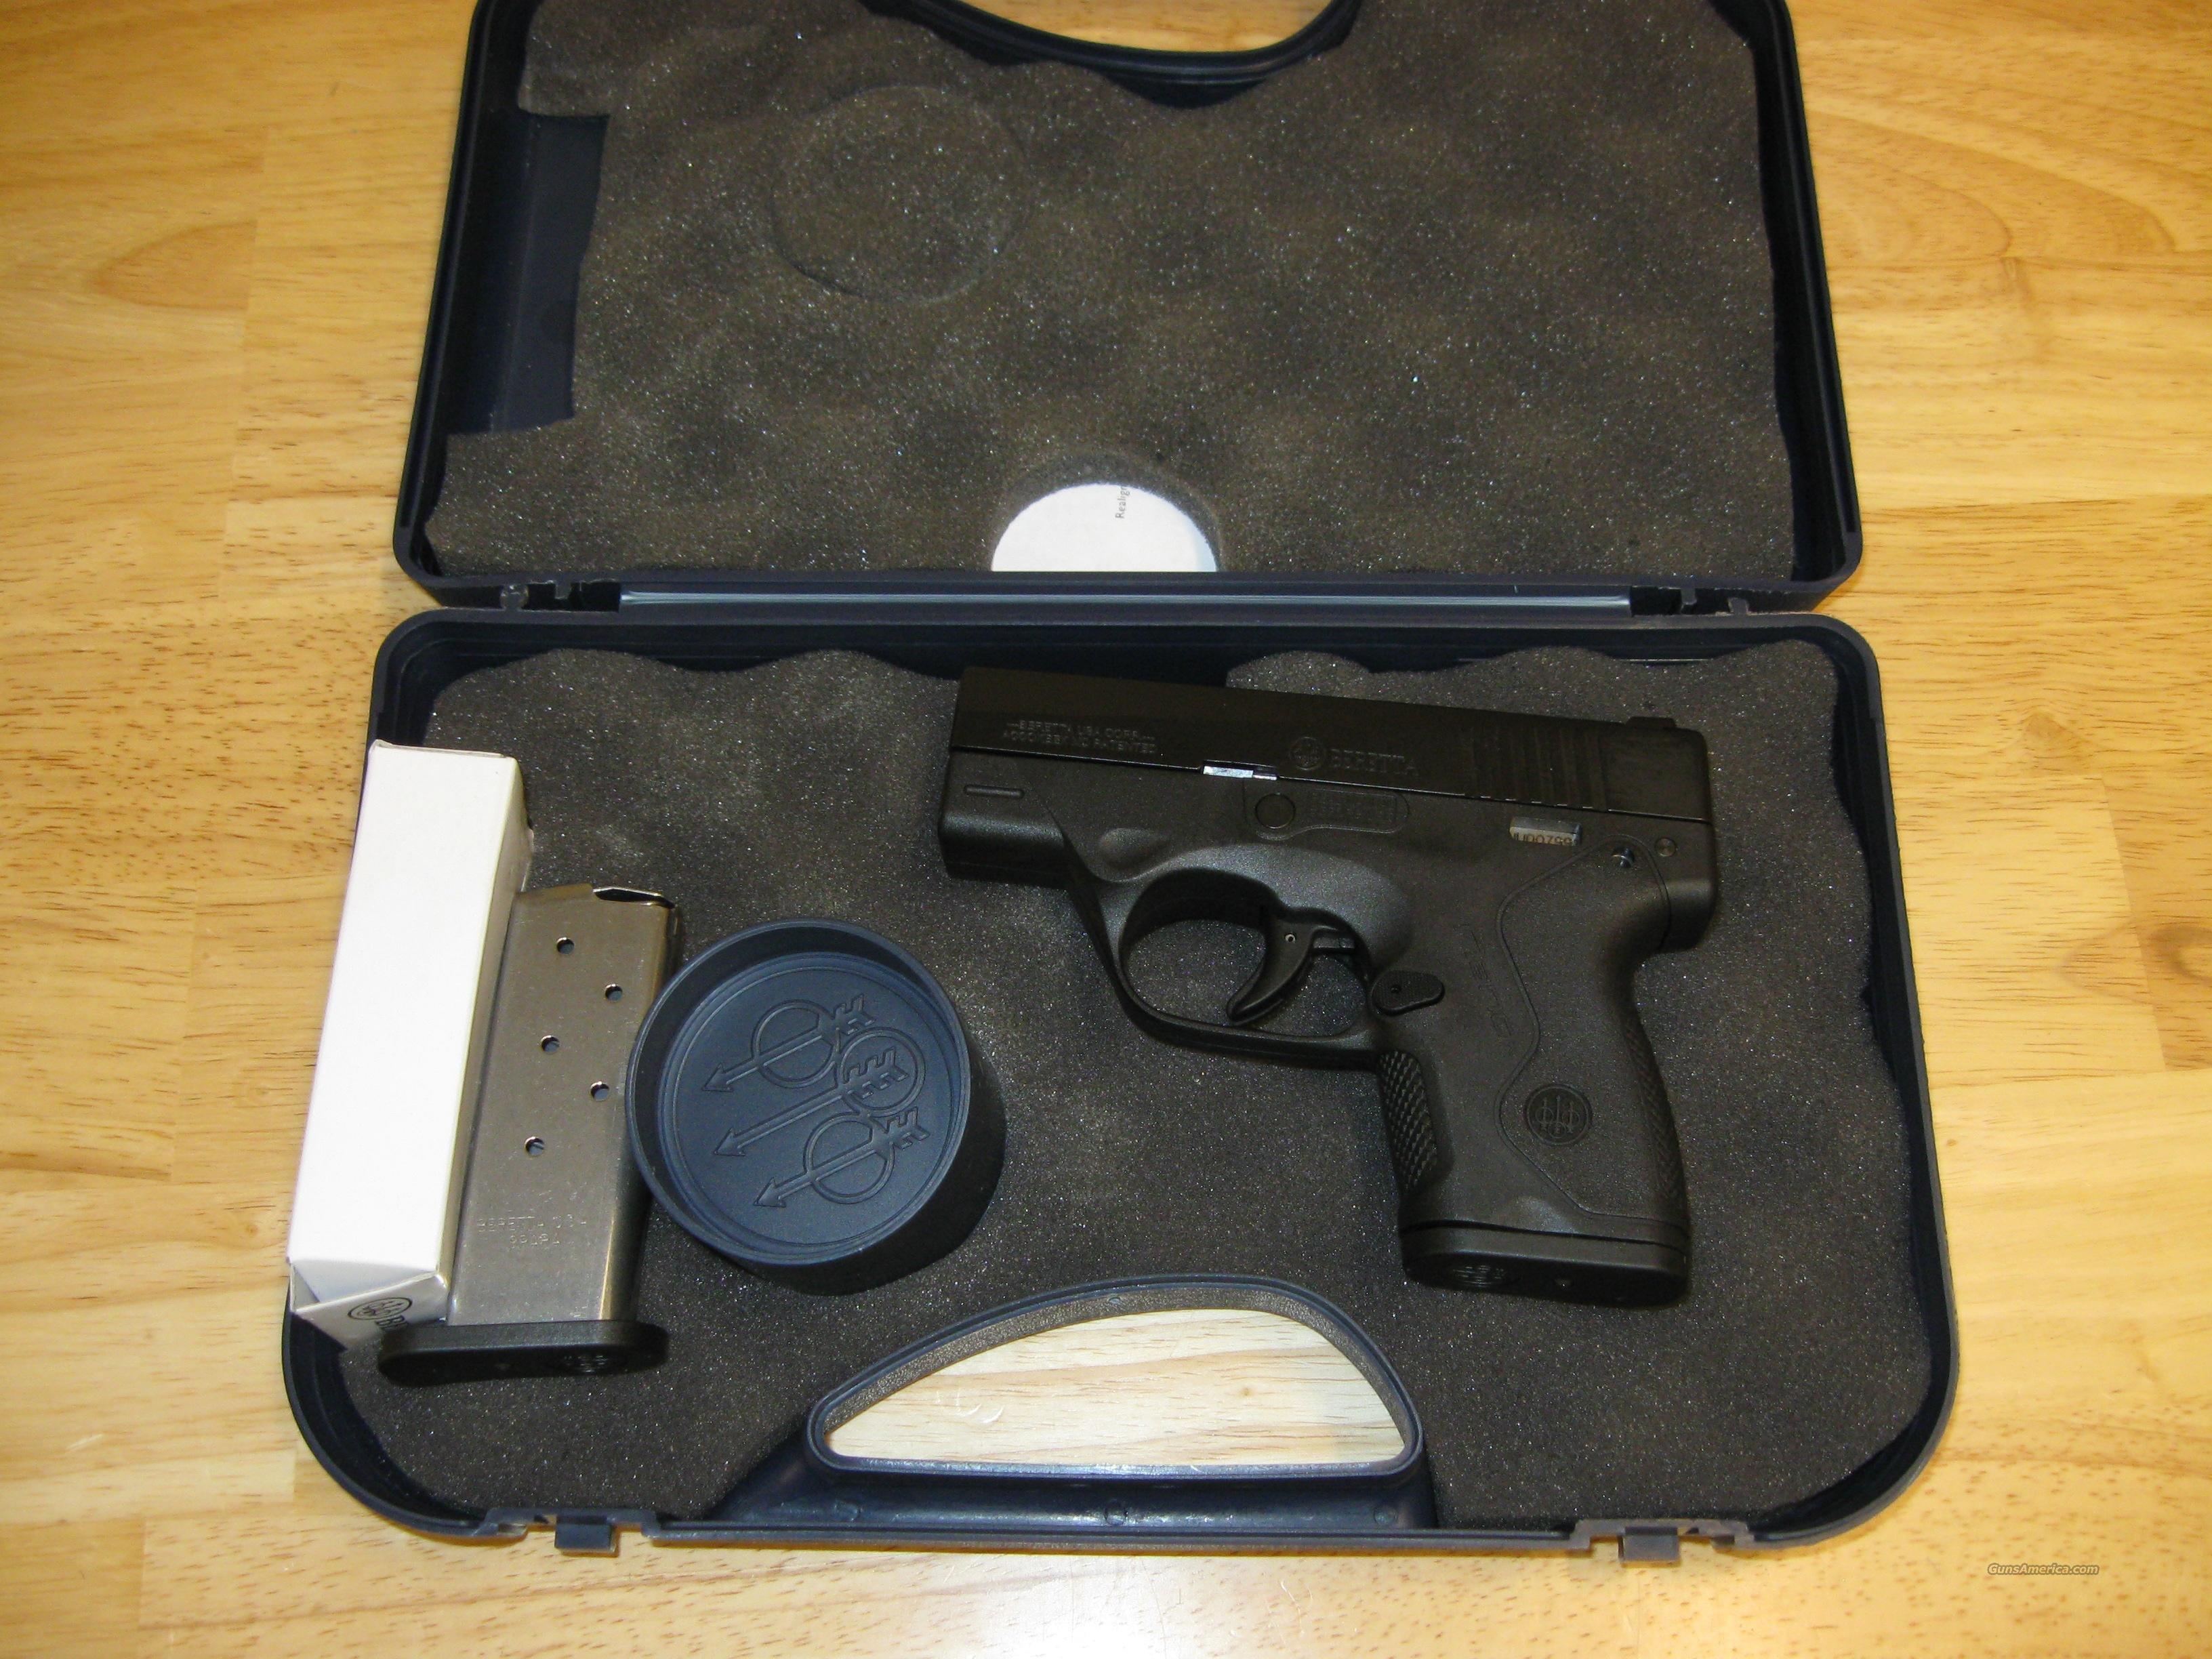 "Beretta Nano Micro Compact Carry Pistol JMN9S15, 9MM, 3.07"", Technopolymer, Pronox Finish  Guns > Pistols > Beretta Pistols > Polymer Frame"